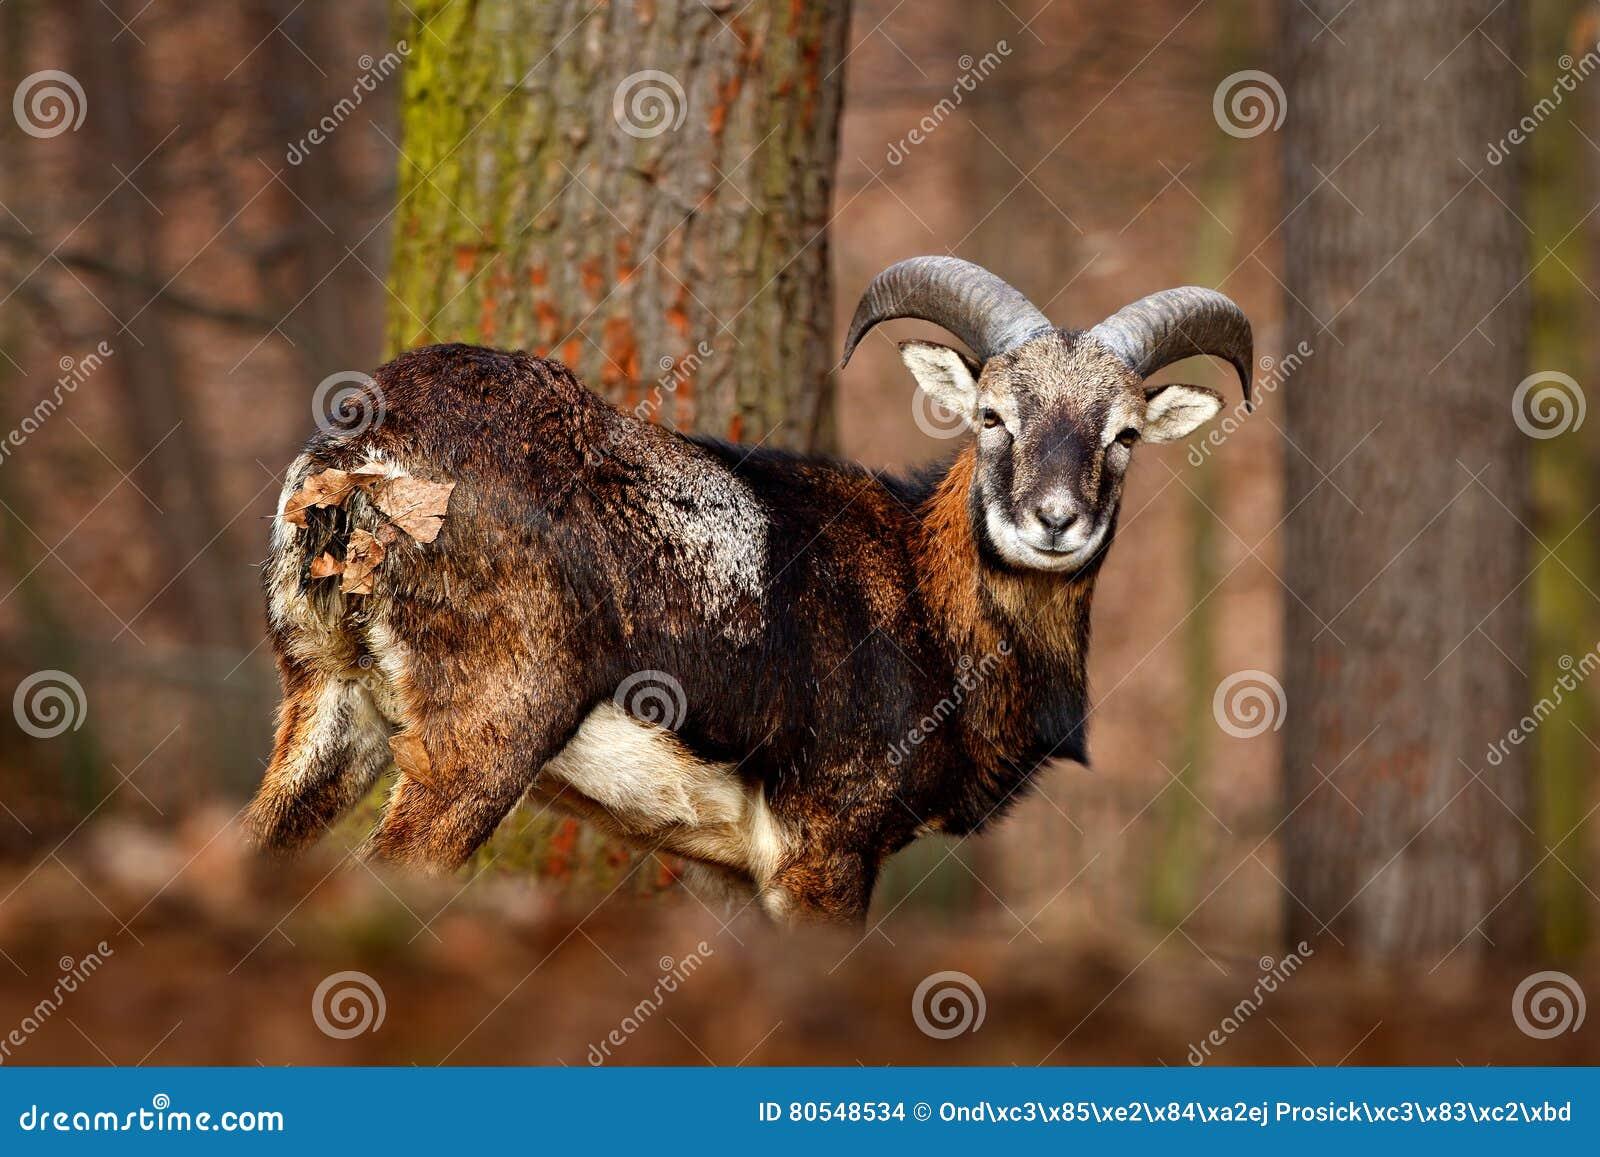 Forest animal in the habitat. Mouflon, Ovis orientalis, forest horned animal in the nature habitat, portrait of mammal with big ho